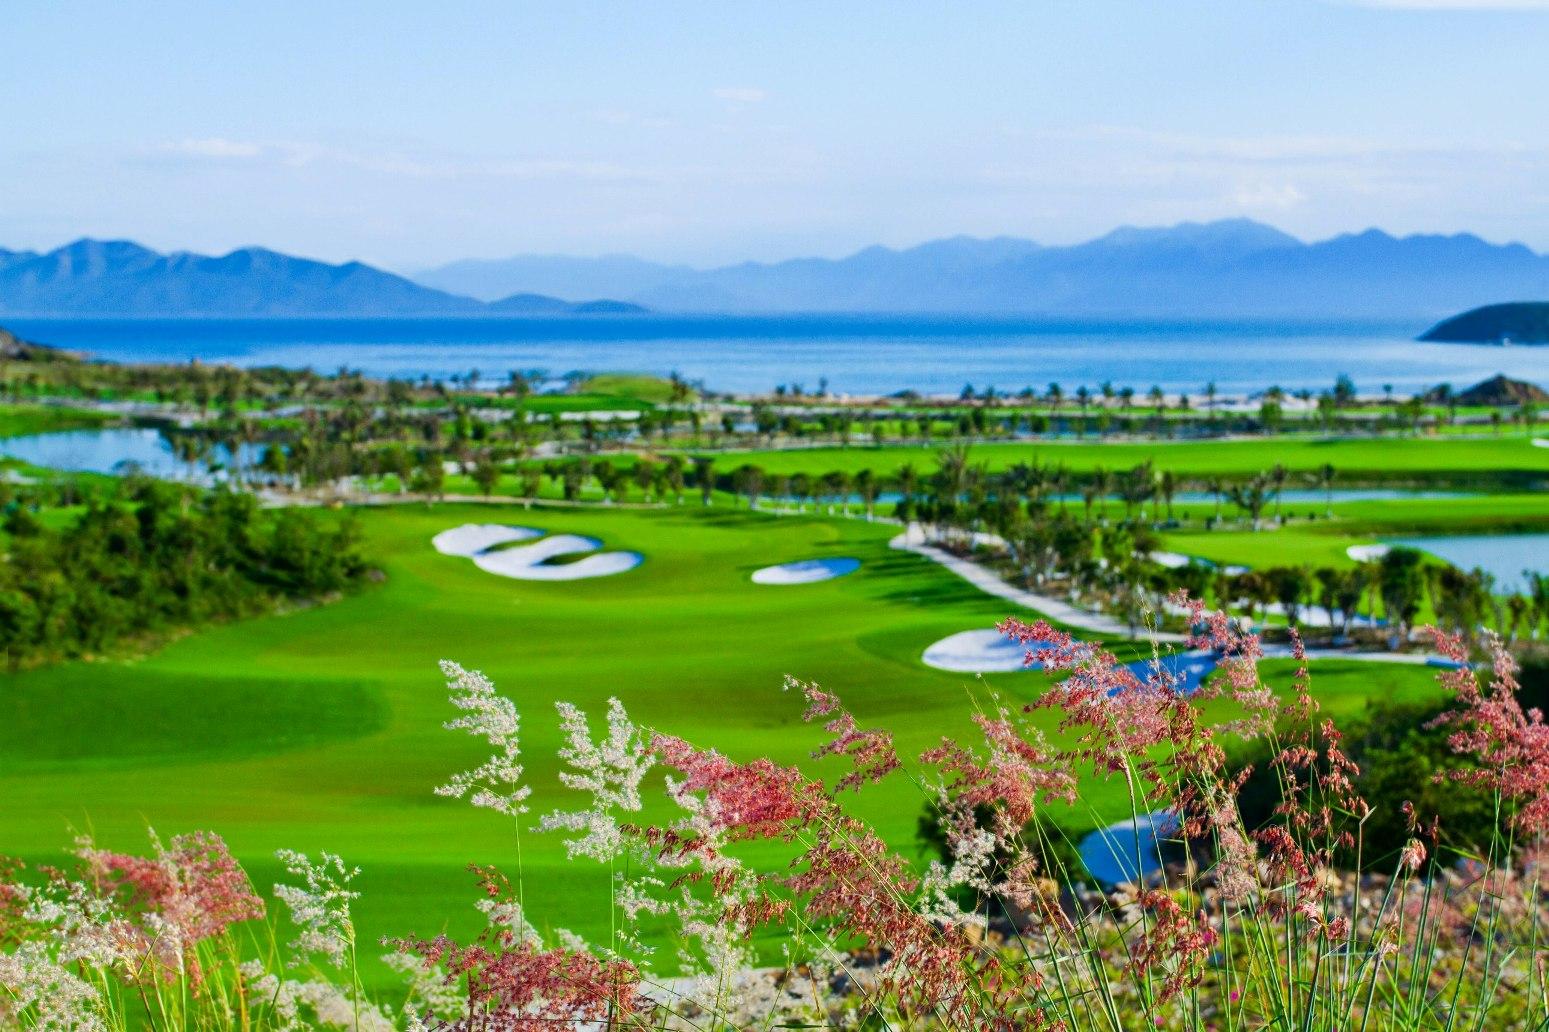 Sân Golf thuộc Vinpearl Phú Quốc